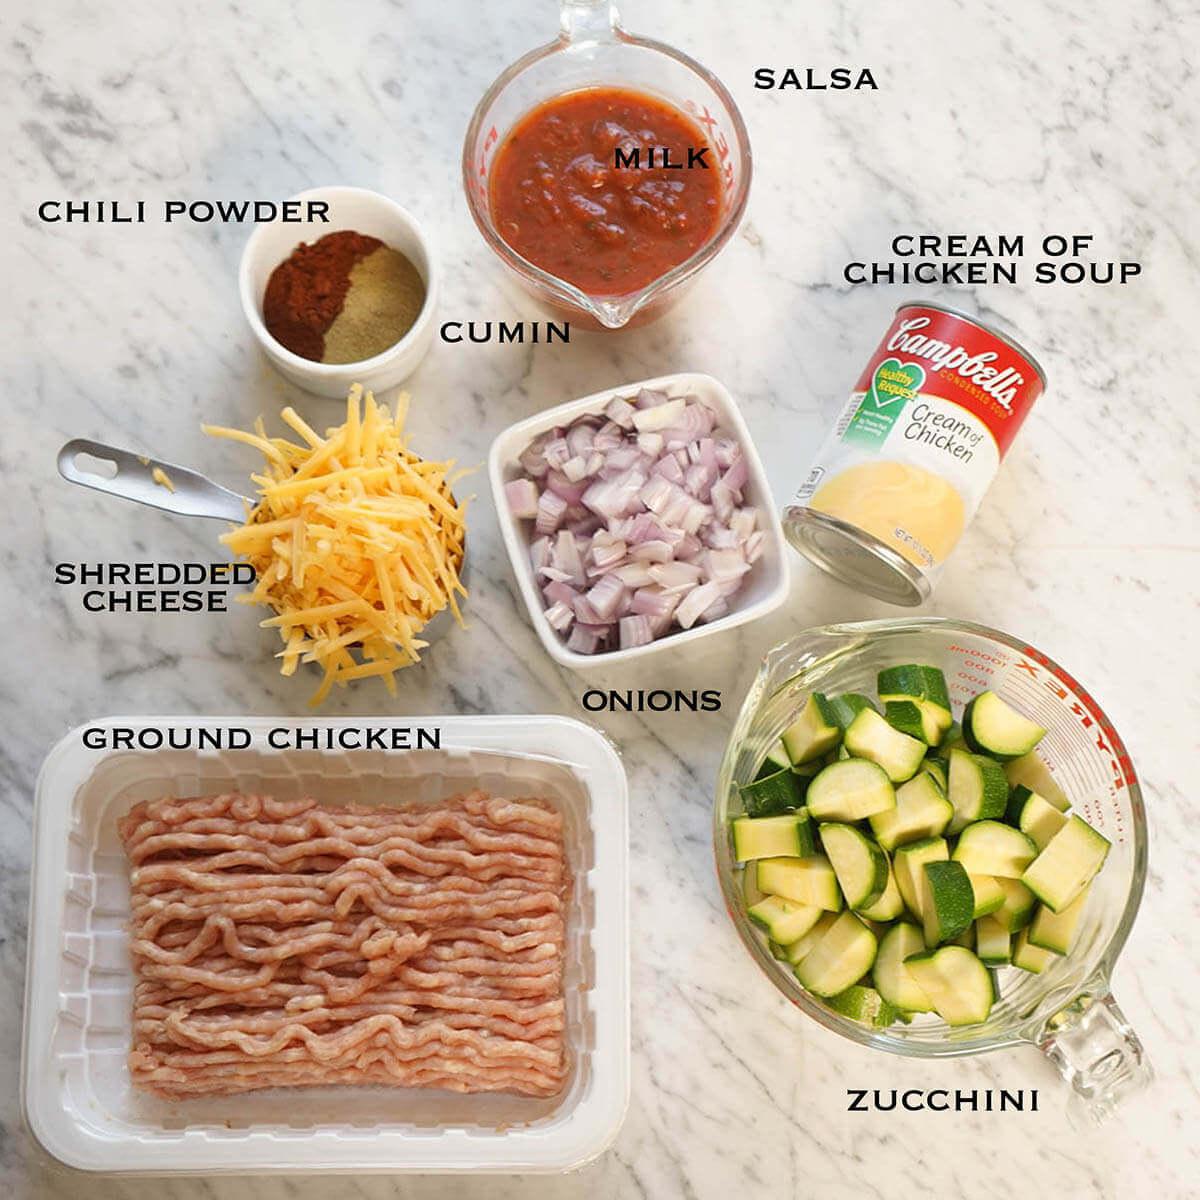 Ingredients to make casserole dish.